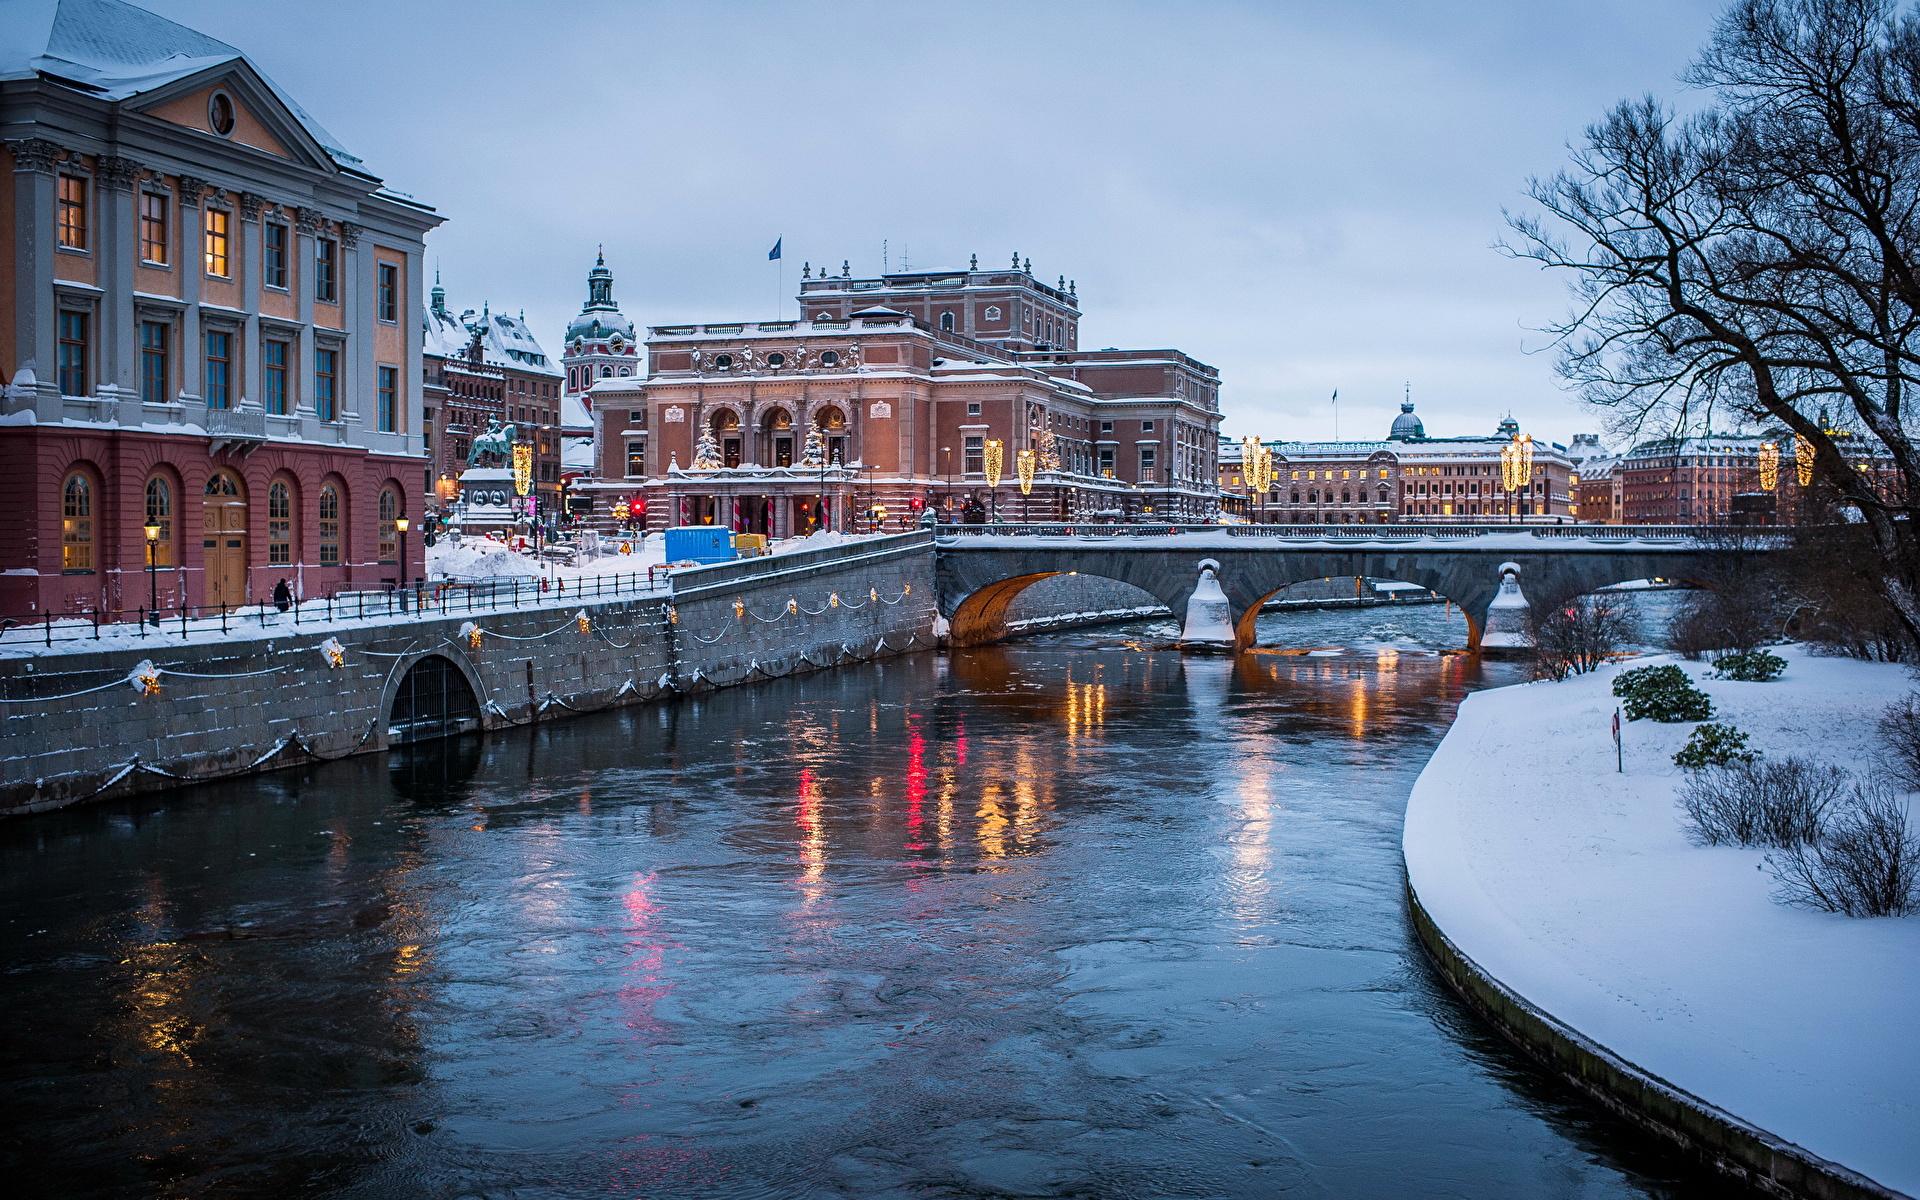 архитектура страны город река Стокгольм Швеция бесплатно